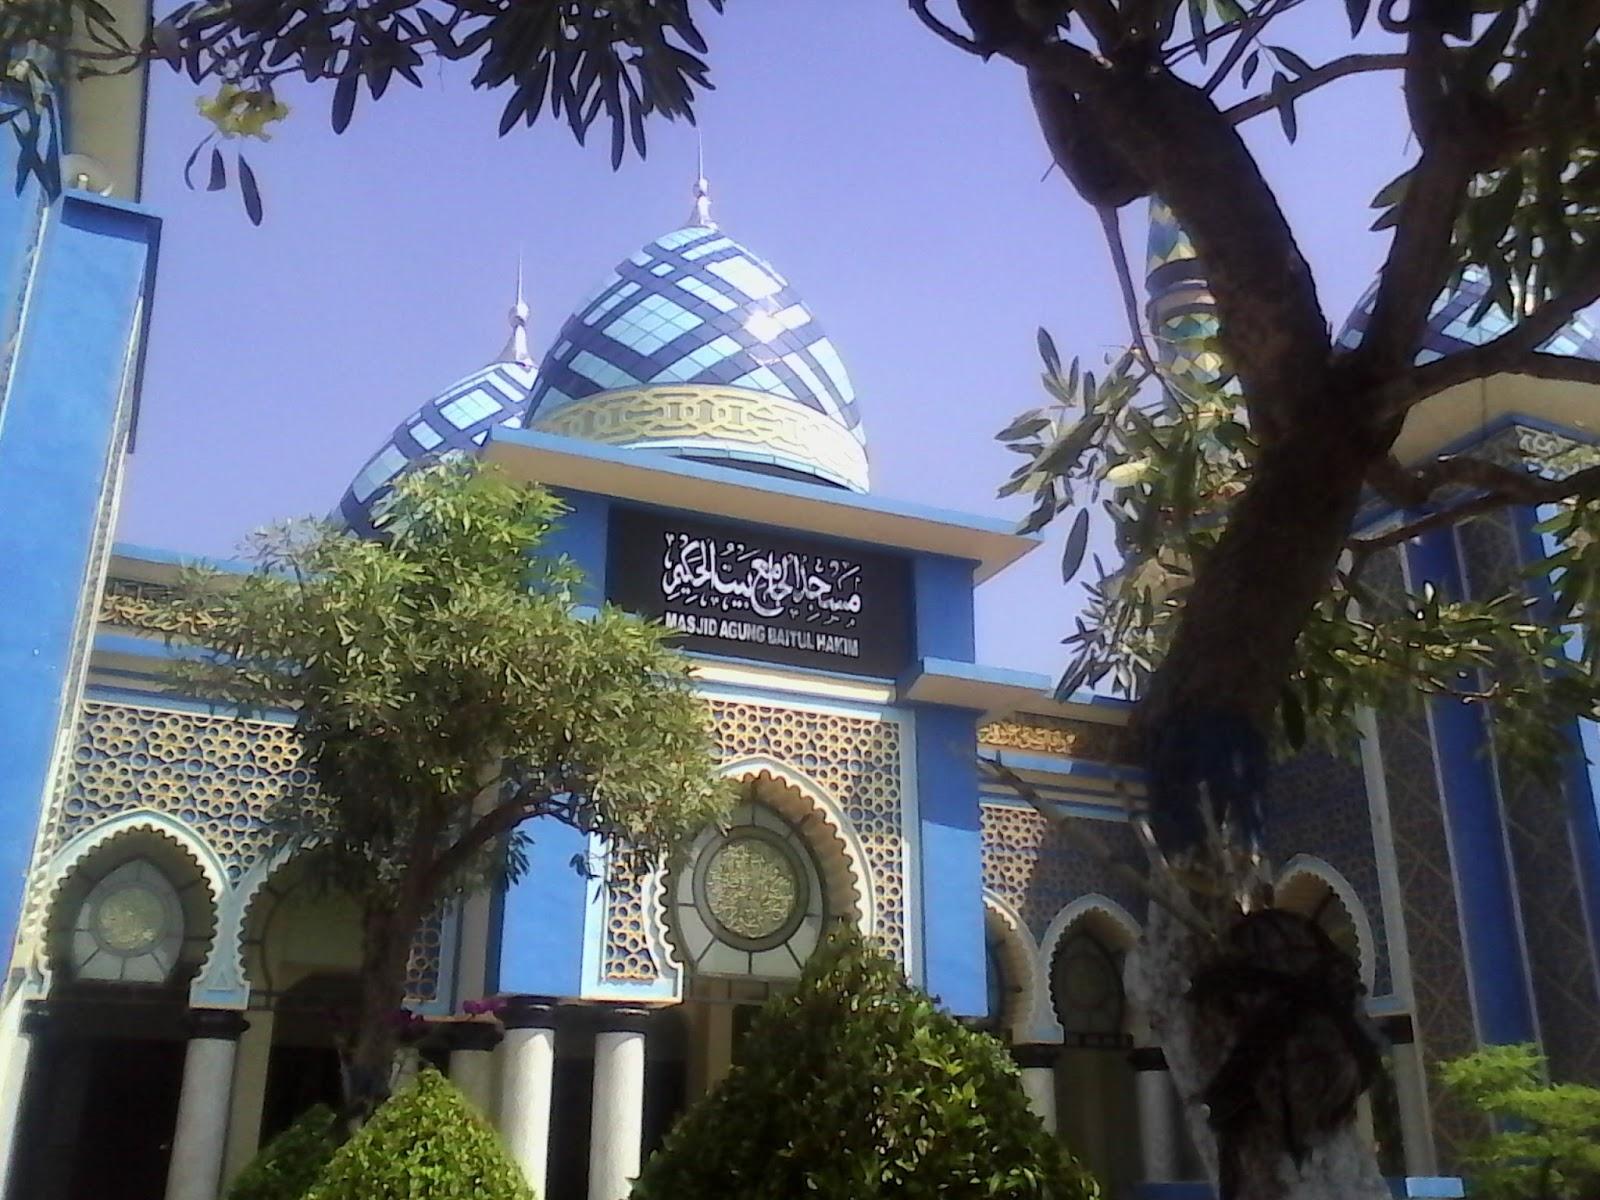 Masjid Agung Baitul Hakim Kota Madiun Terbesar Letaknya Sebelah Barat